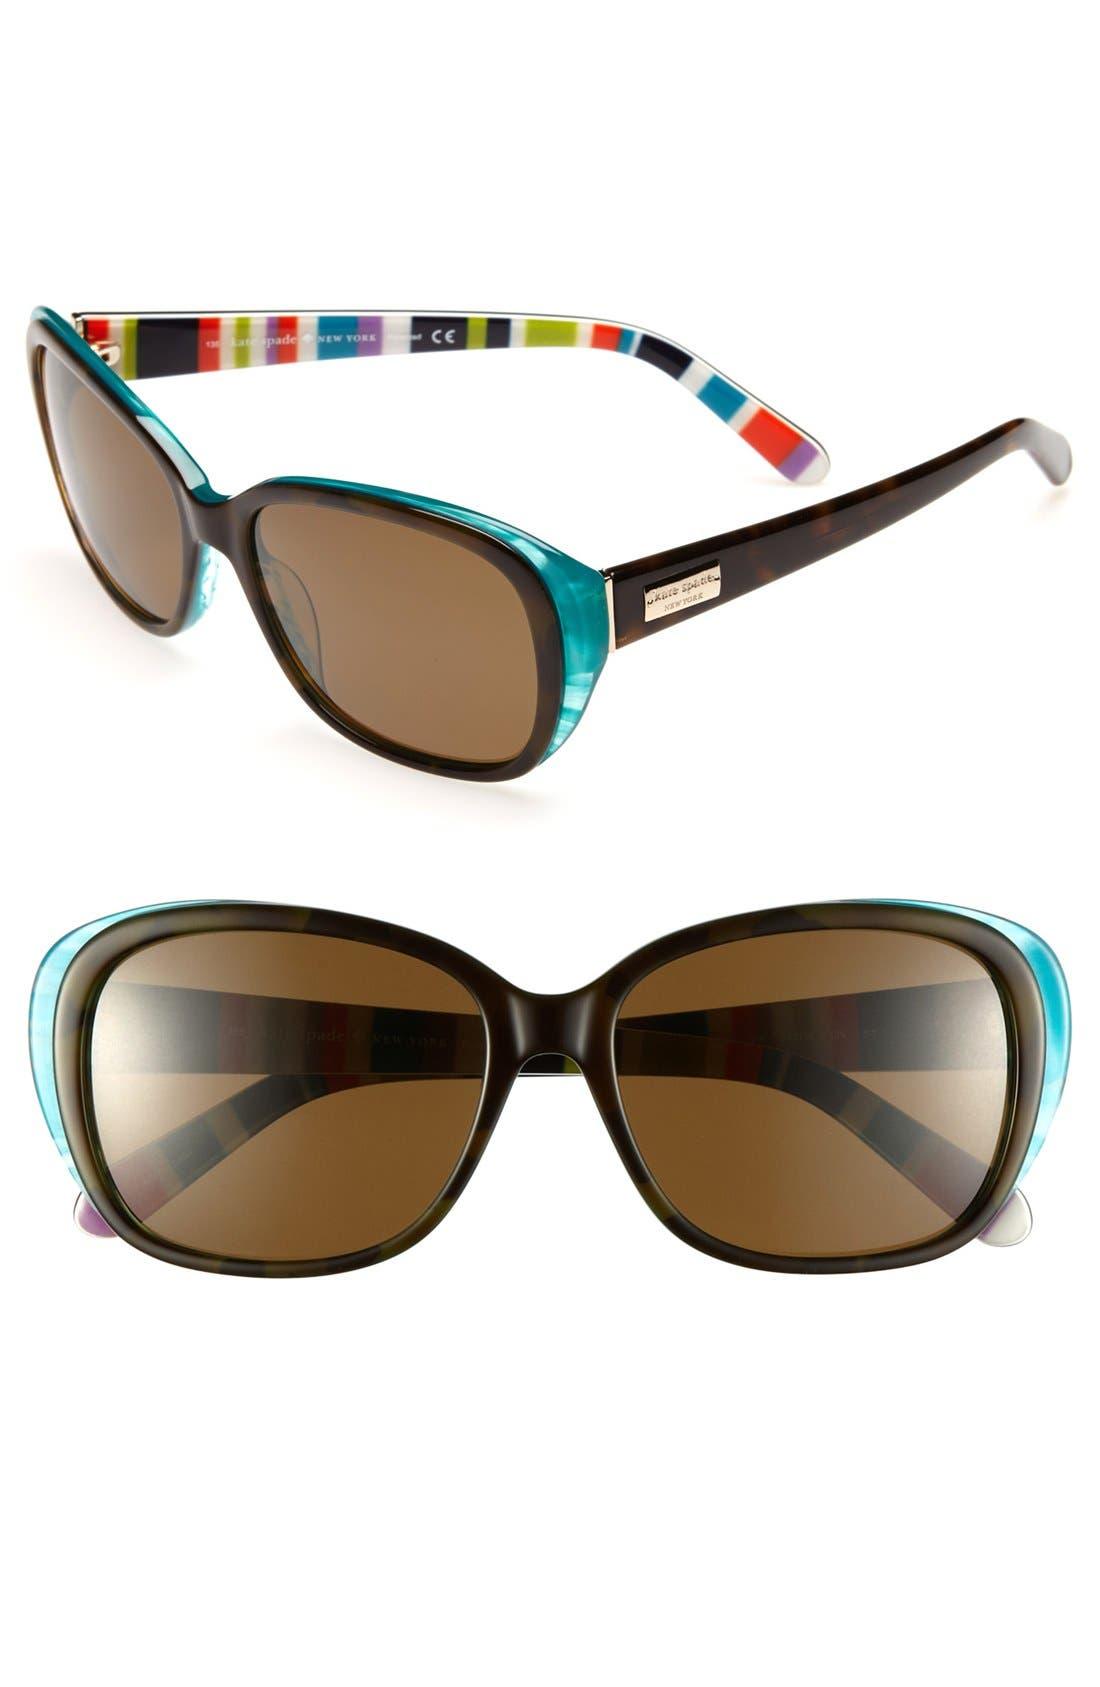 Alternate Image 1 Selected - kate spade new york 'hilde' 54mm polarized sunglasses